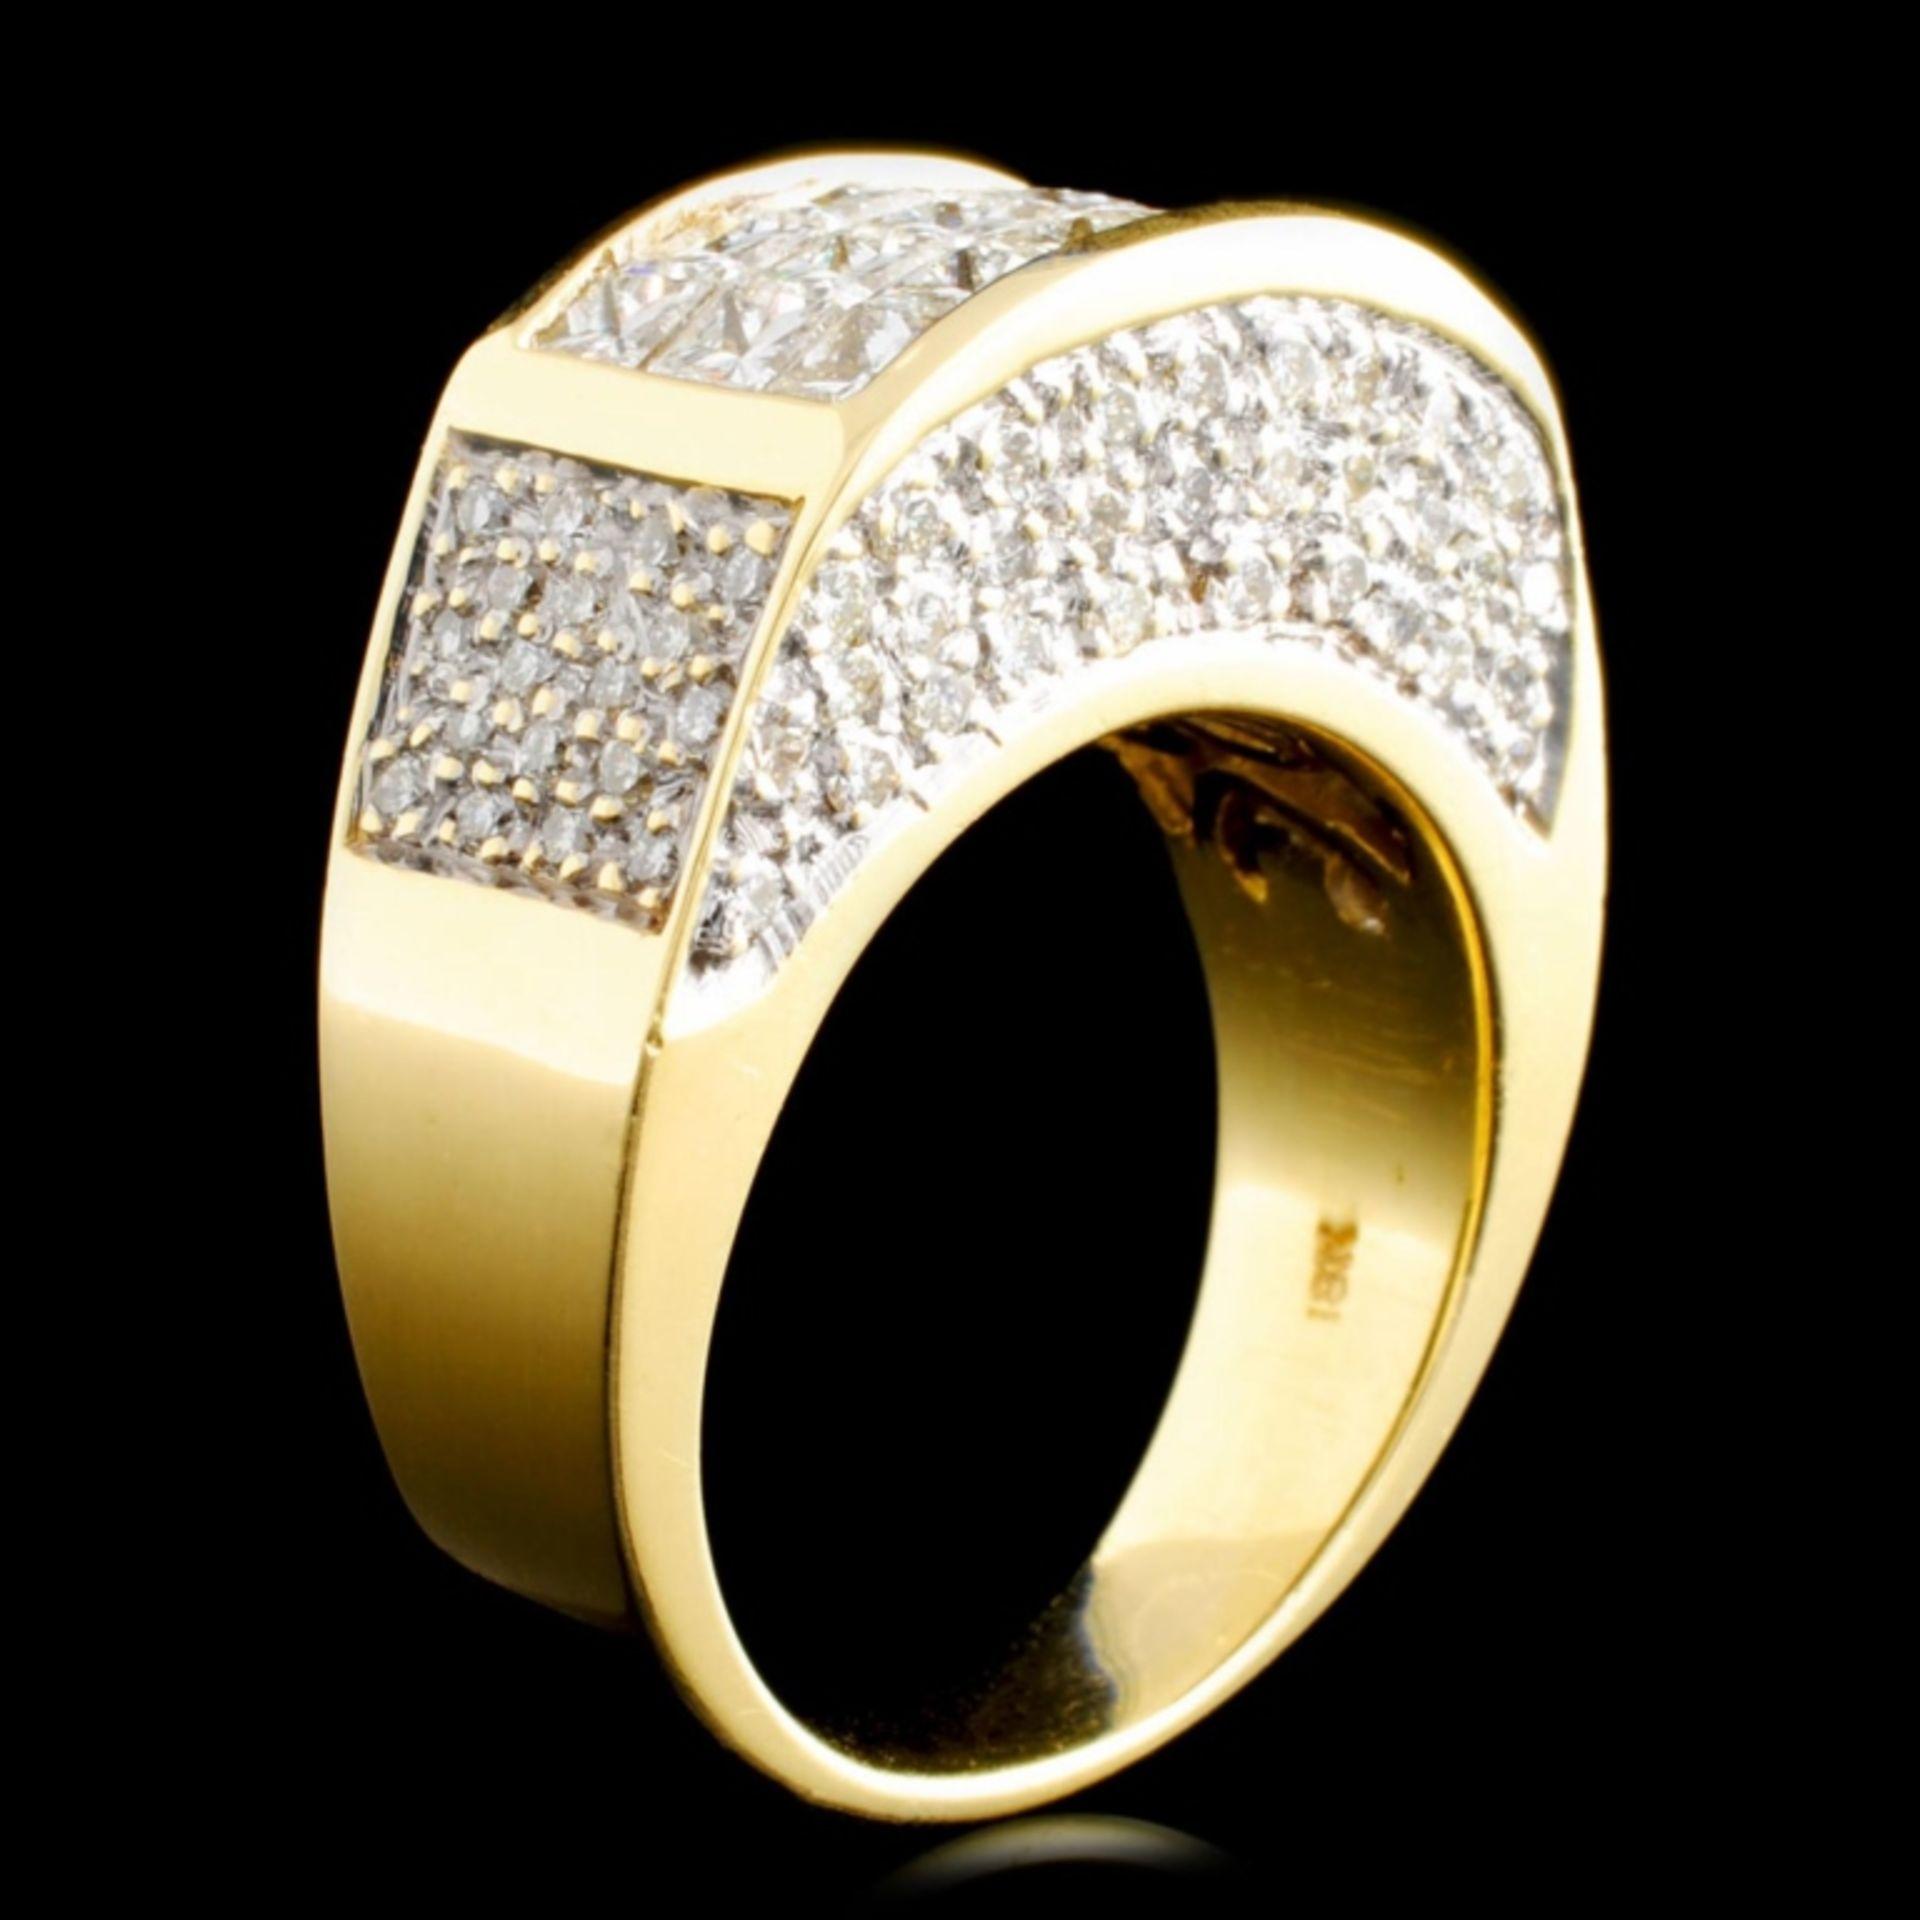 18K Gold 2.79ctw Diamond Ring - Image 2 of 5